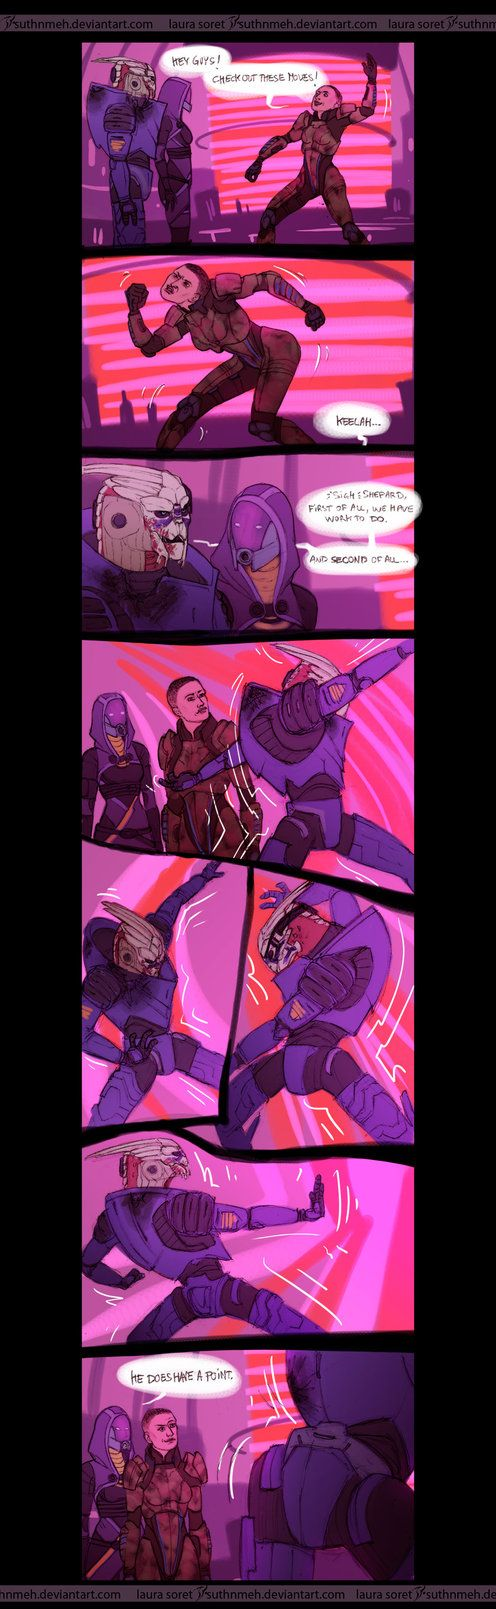 Mass Effect - Dance by suthnmeh on DeviantArt